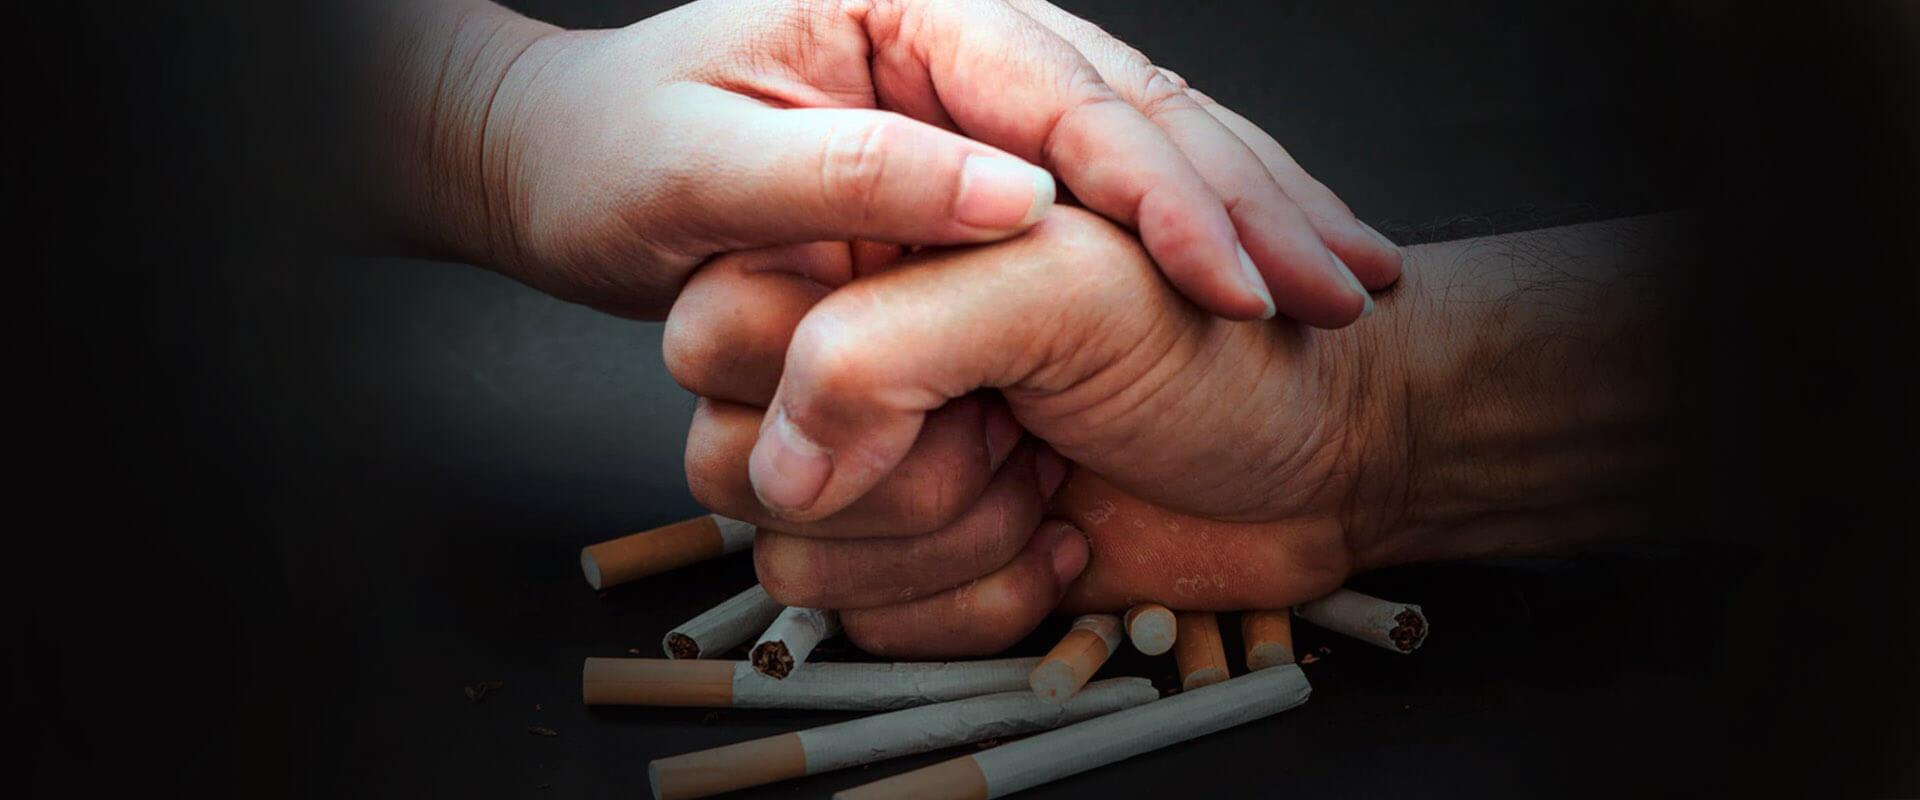 Я хочу бросить курить